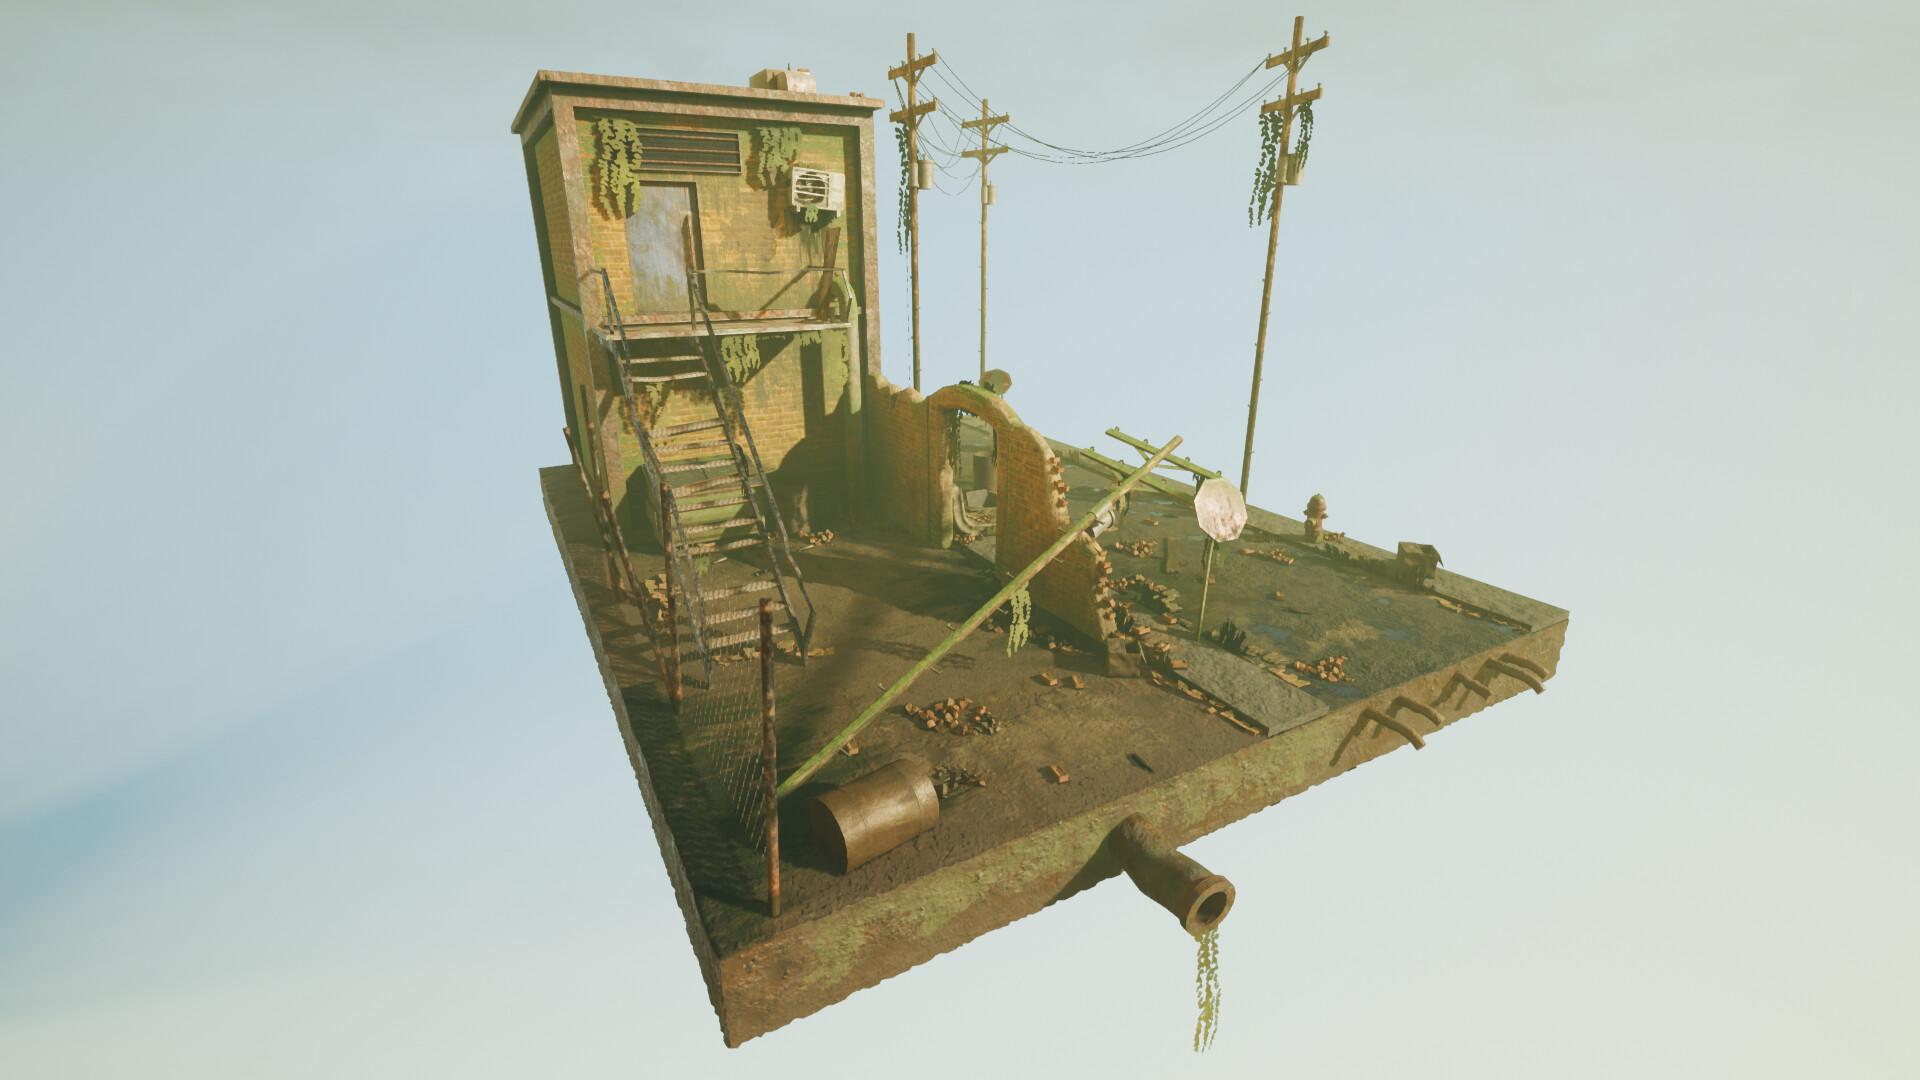 ArtStation - Urban Decay - Diorama, Ruben Chatha